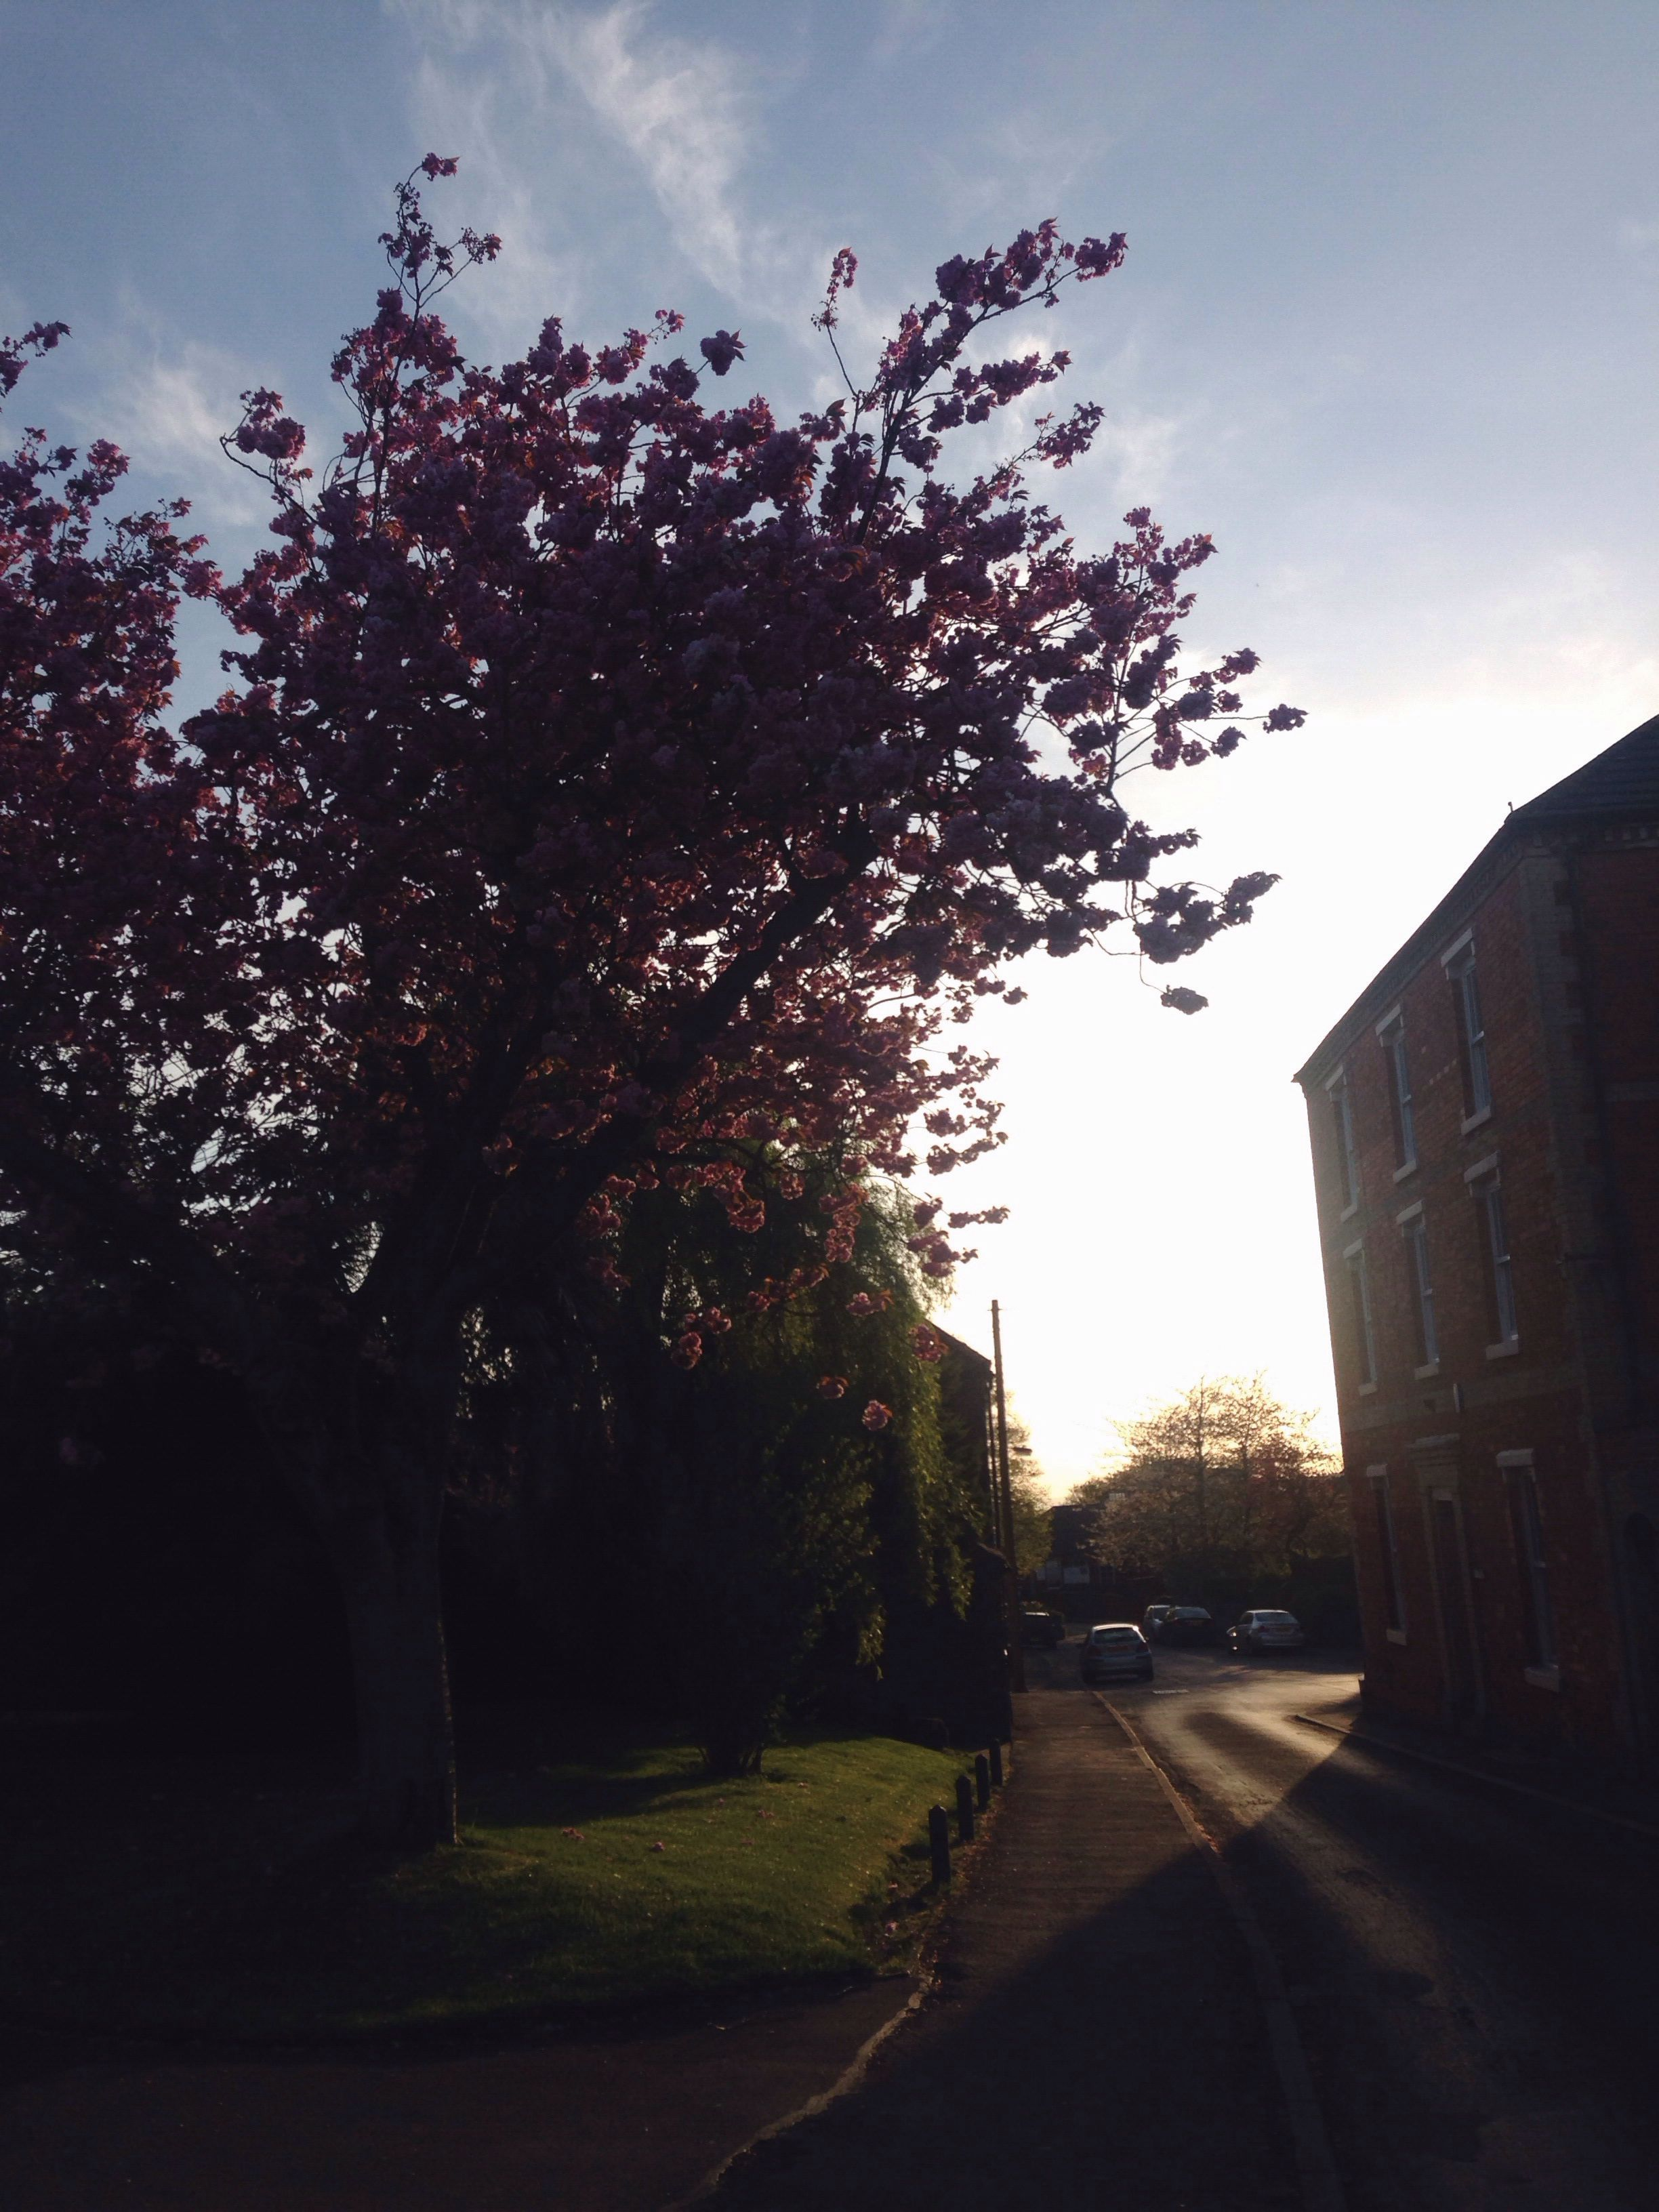 Caistor, lincolnshire